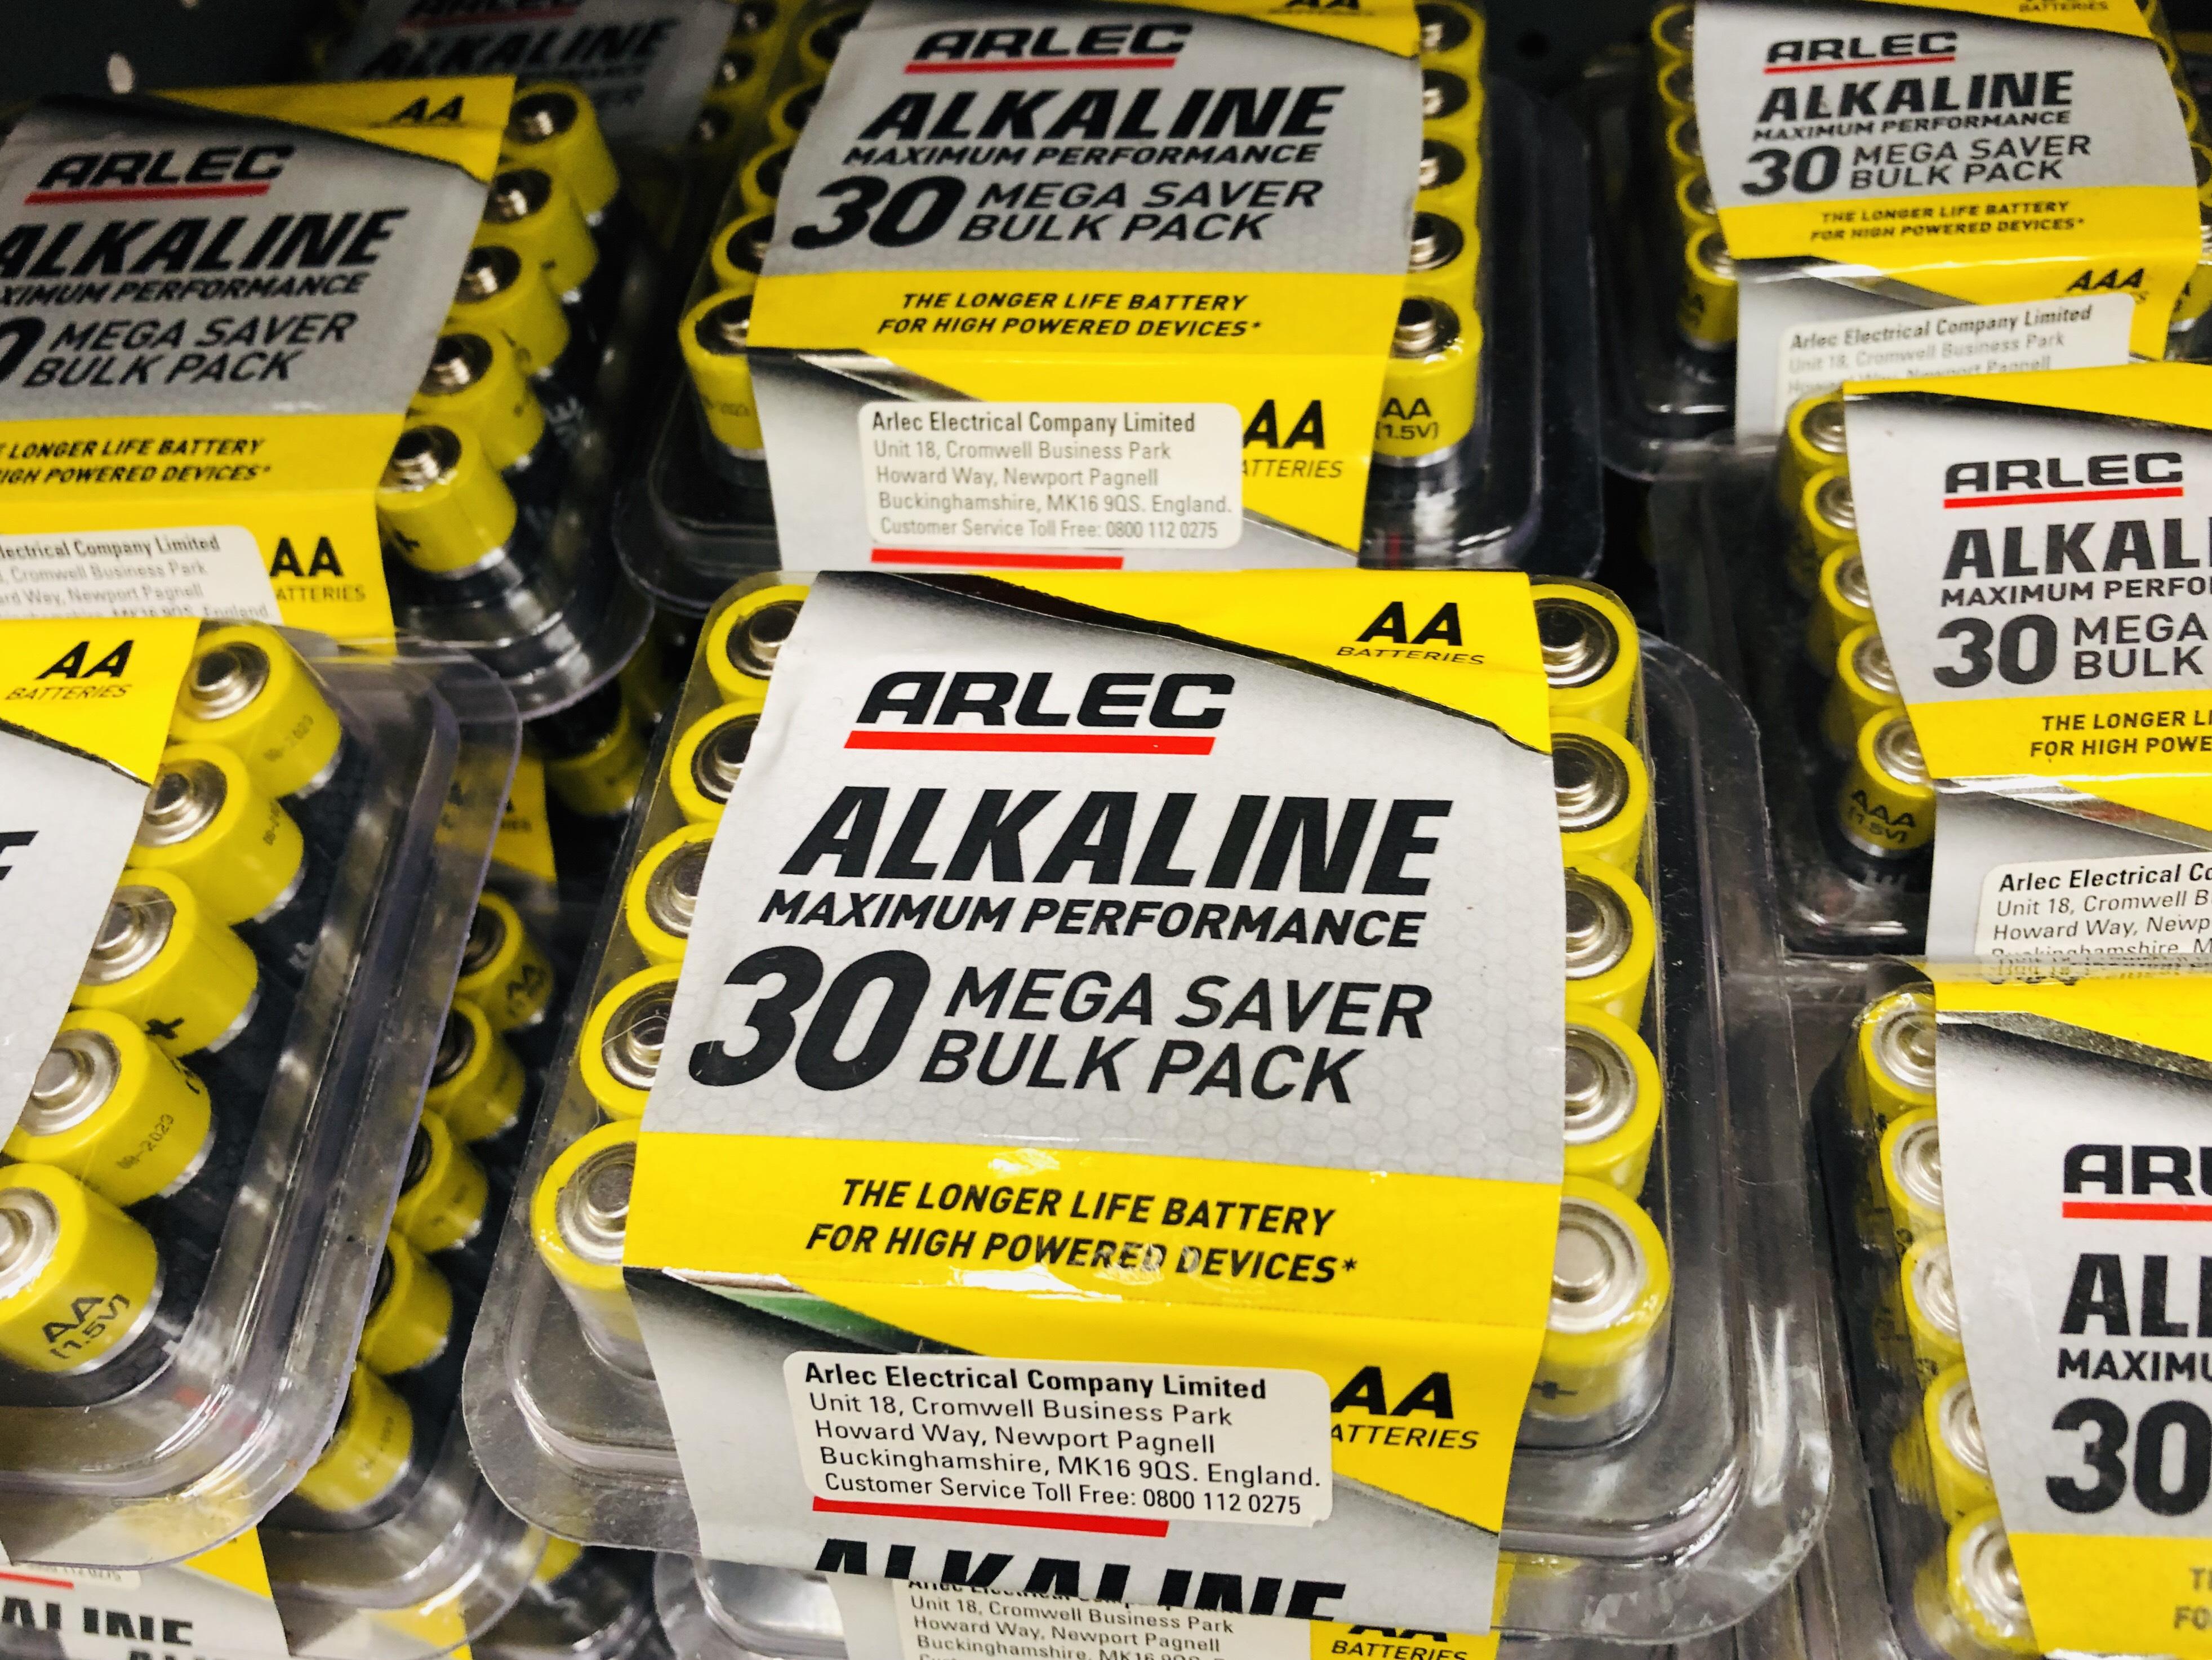 30PK AA or AAA Arlen Alkaline Batteries - £2.10 at Homebase Truro